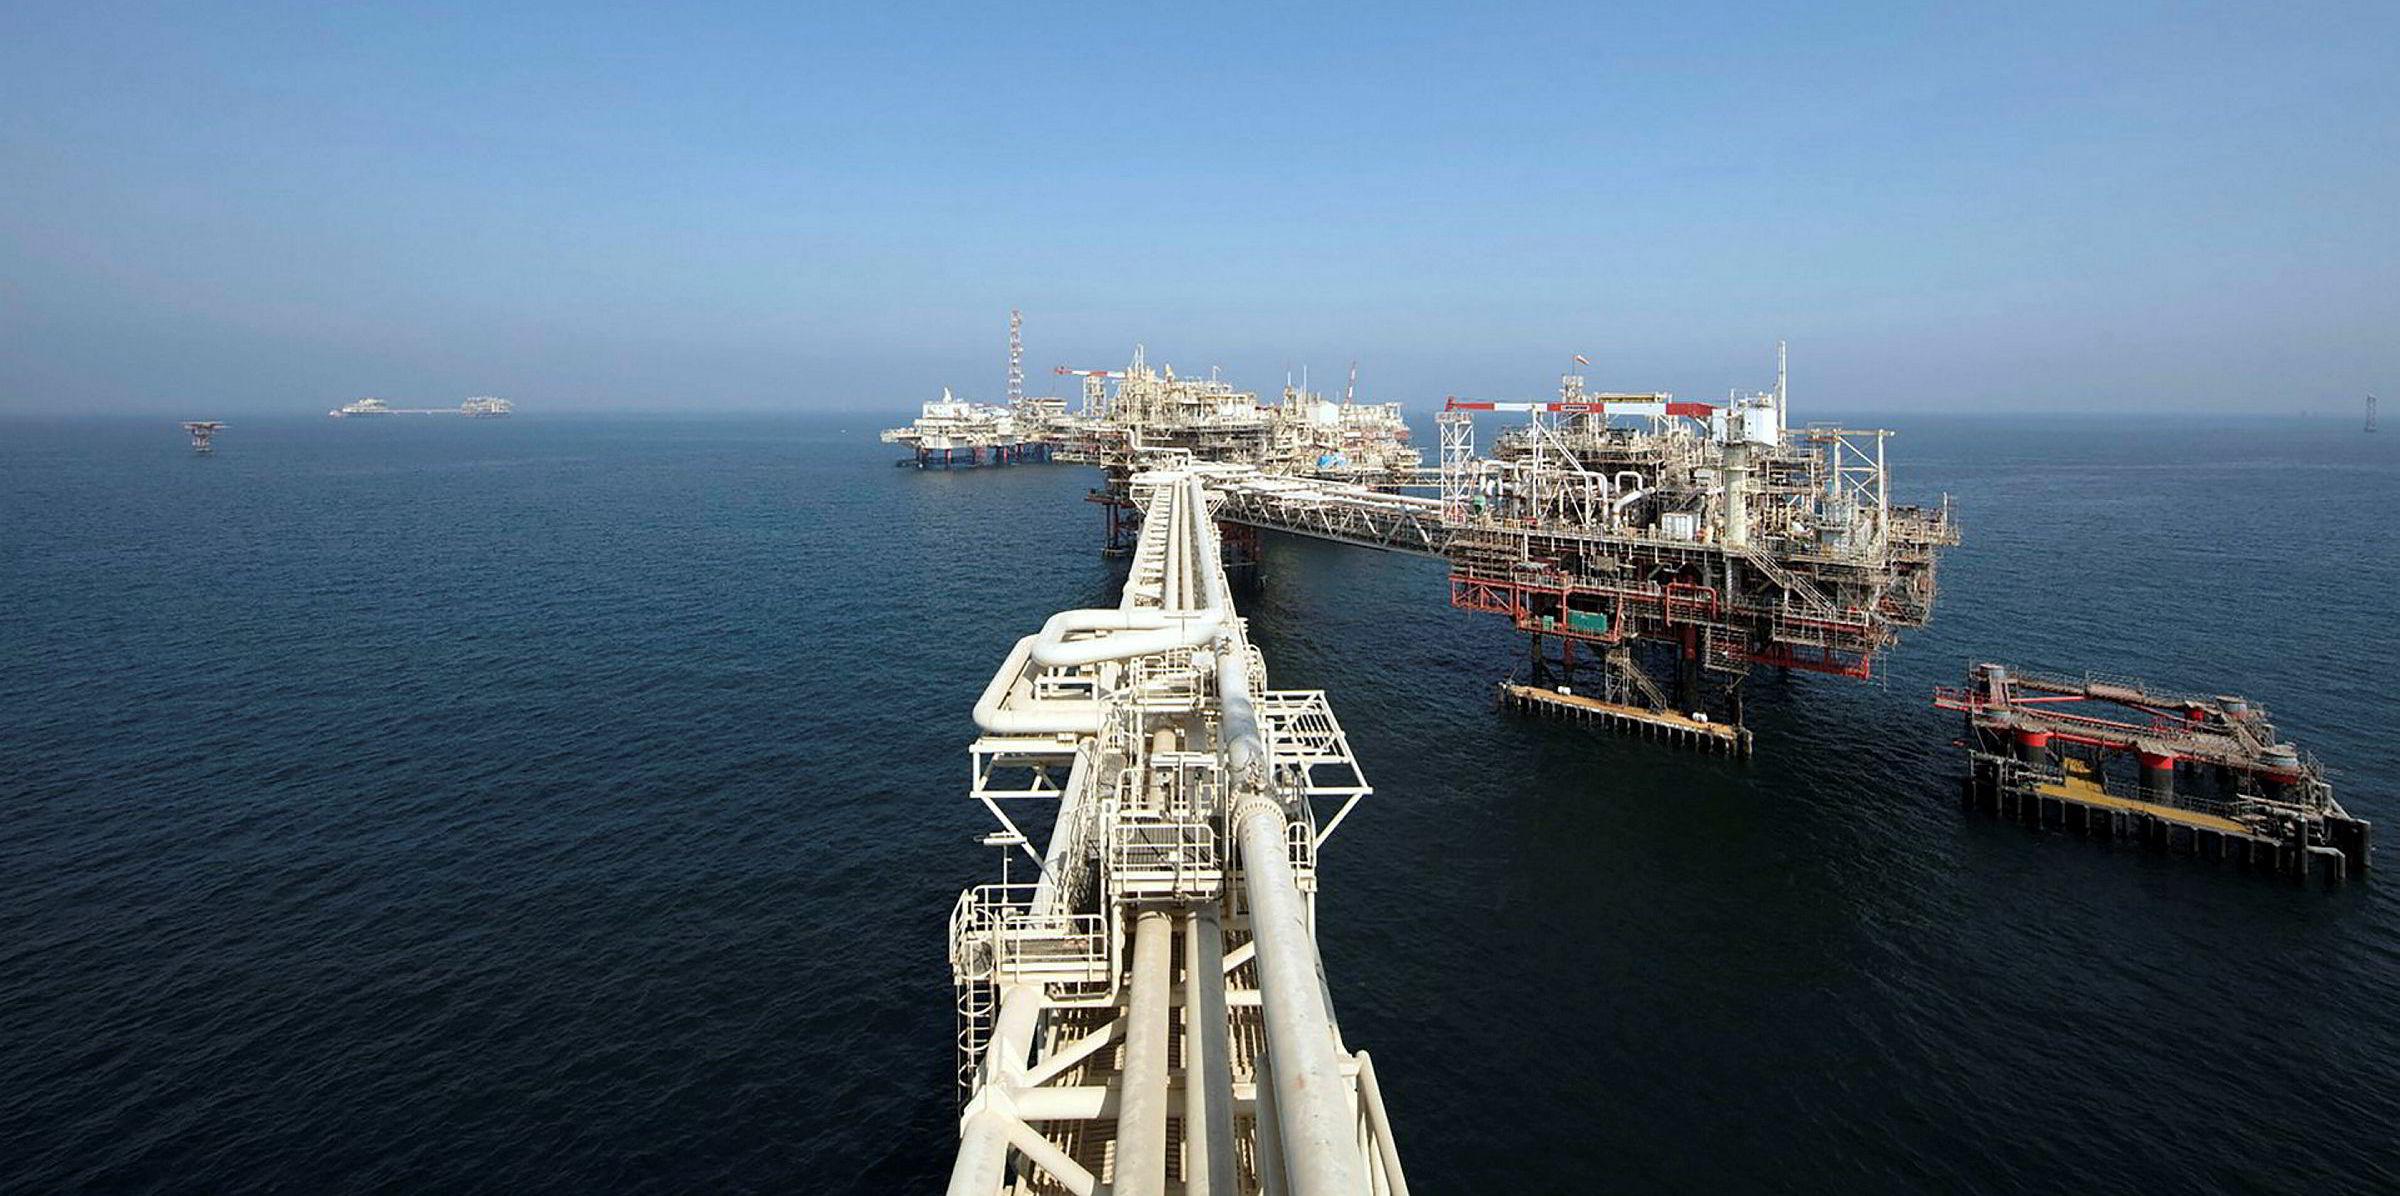 Adnoc sets plans for new Umm Shaif output drive | Upstream